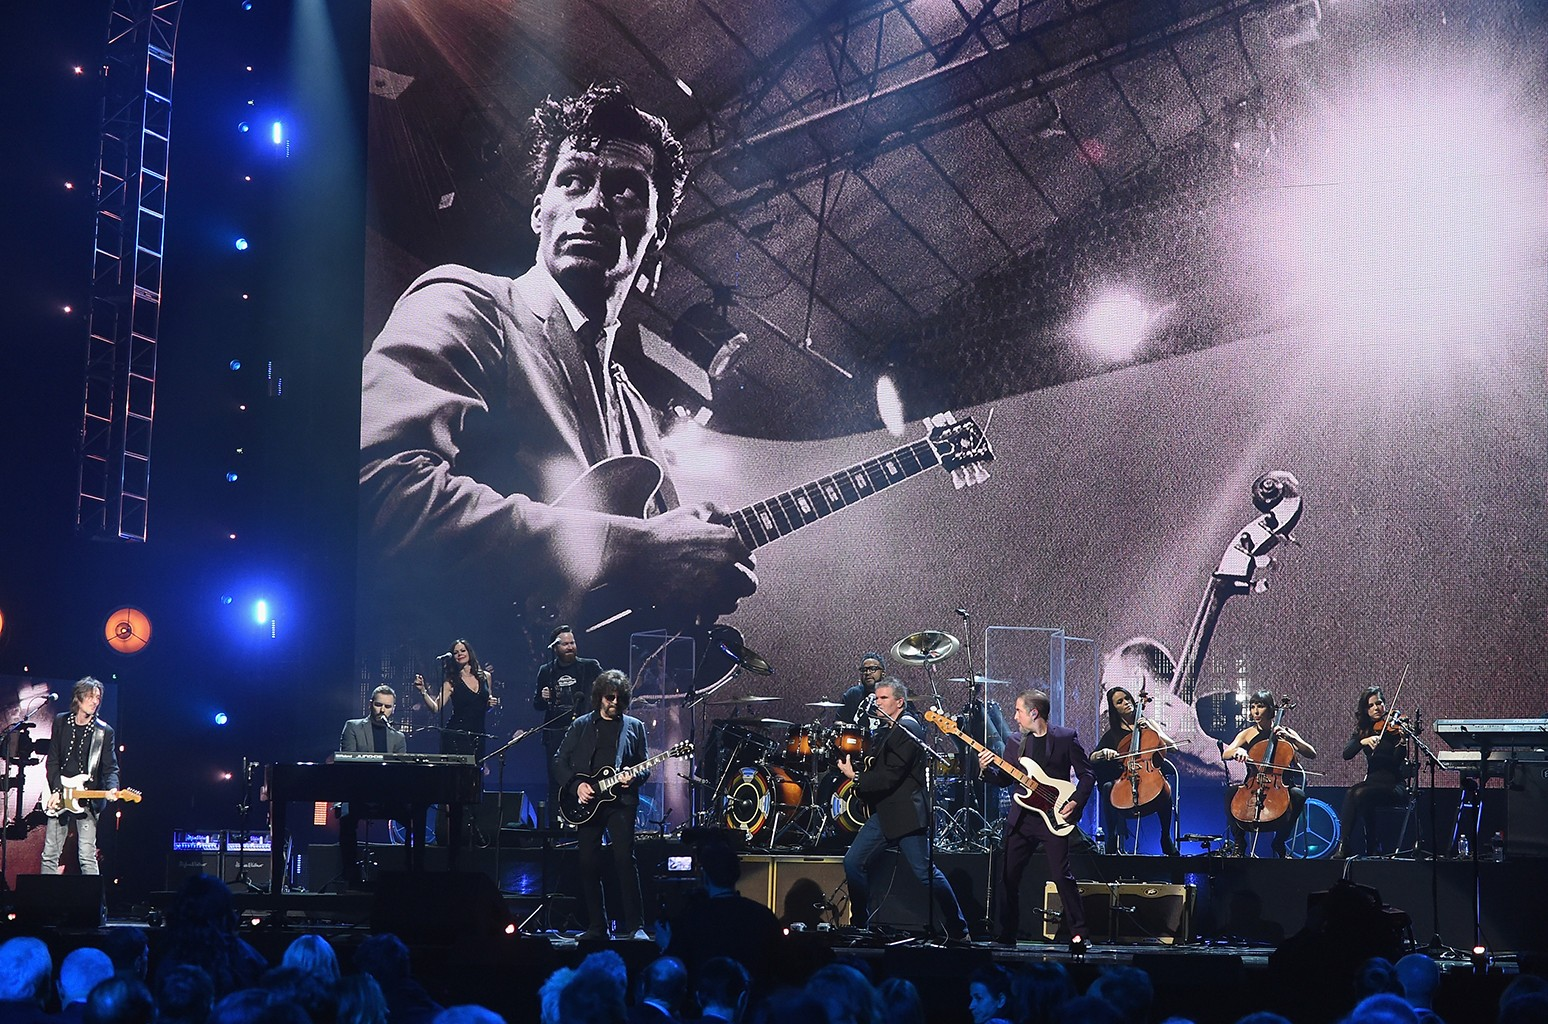 ELO's Chuck Berry tribute